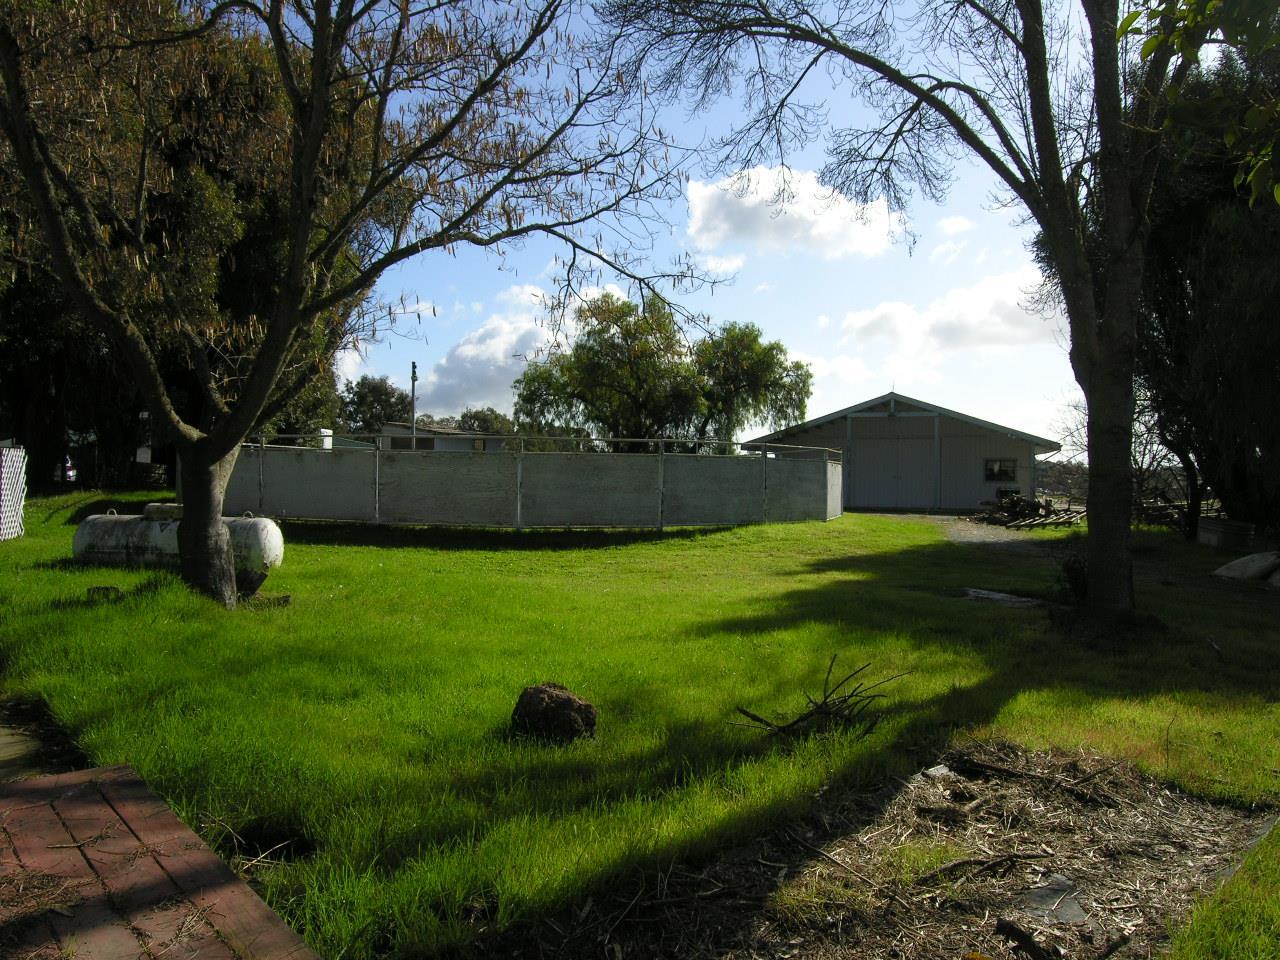 2450 Meadow Lark LN Gilroy, CA 95020